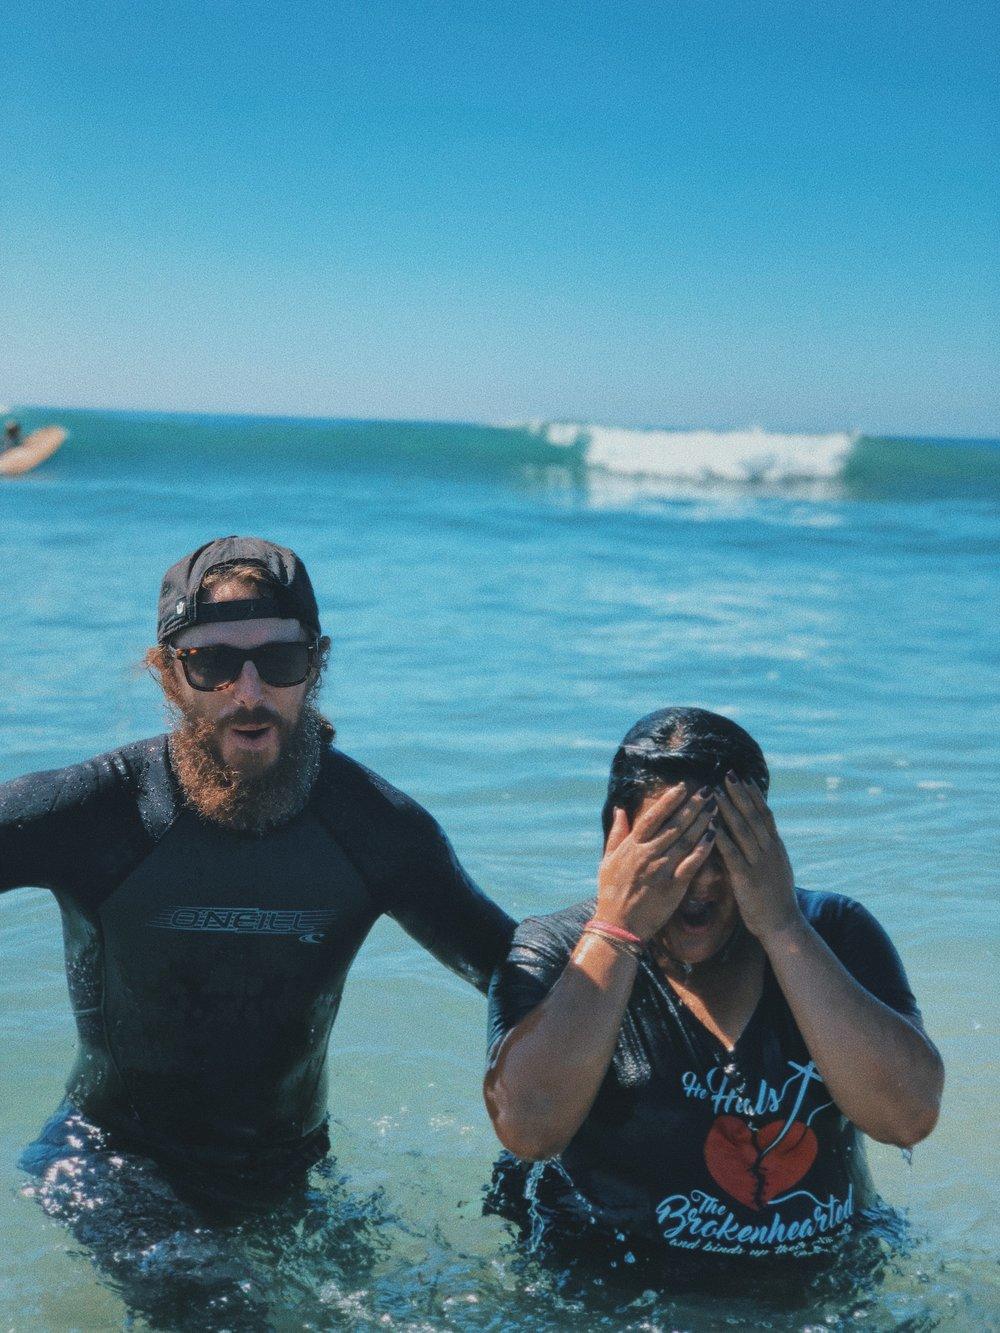 malibu-beach-baptism-mission-hills-christian-church-10.jpg